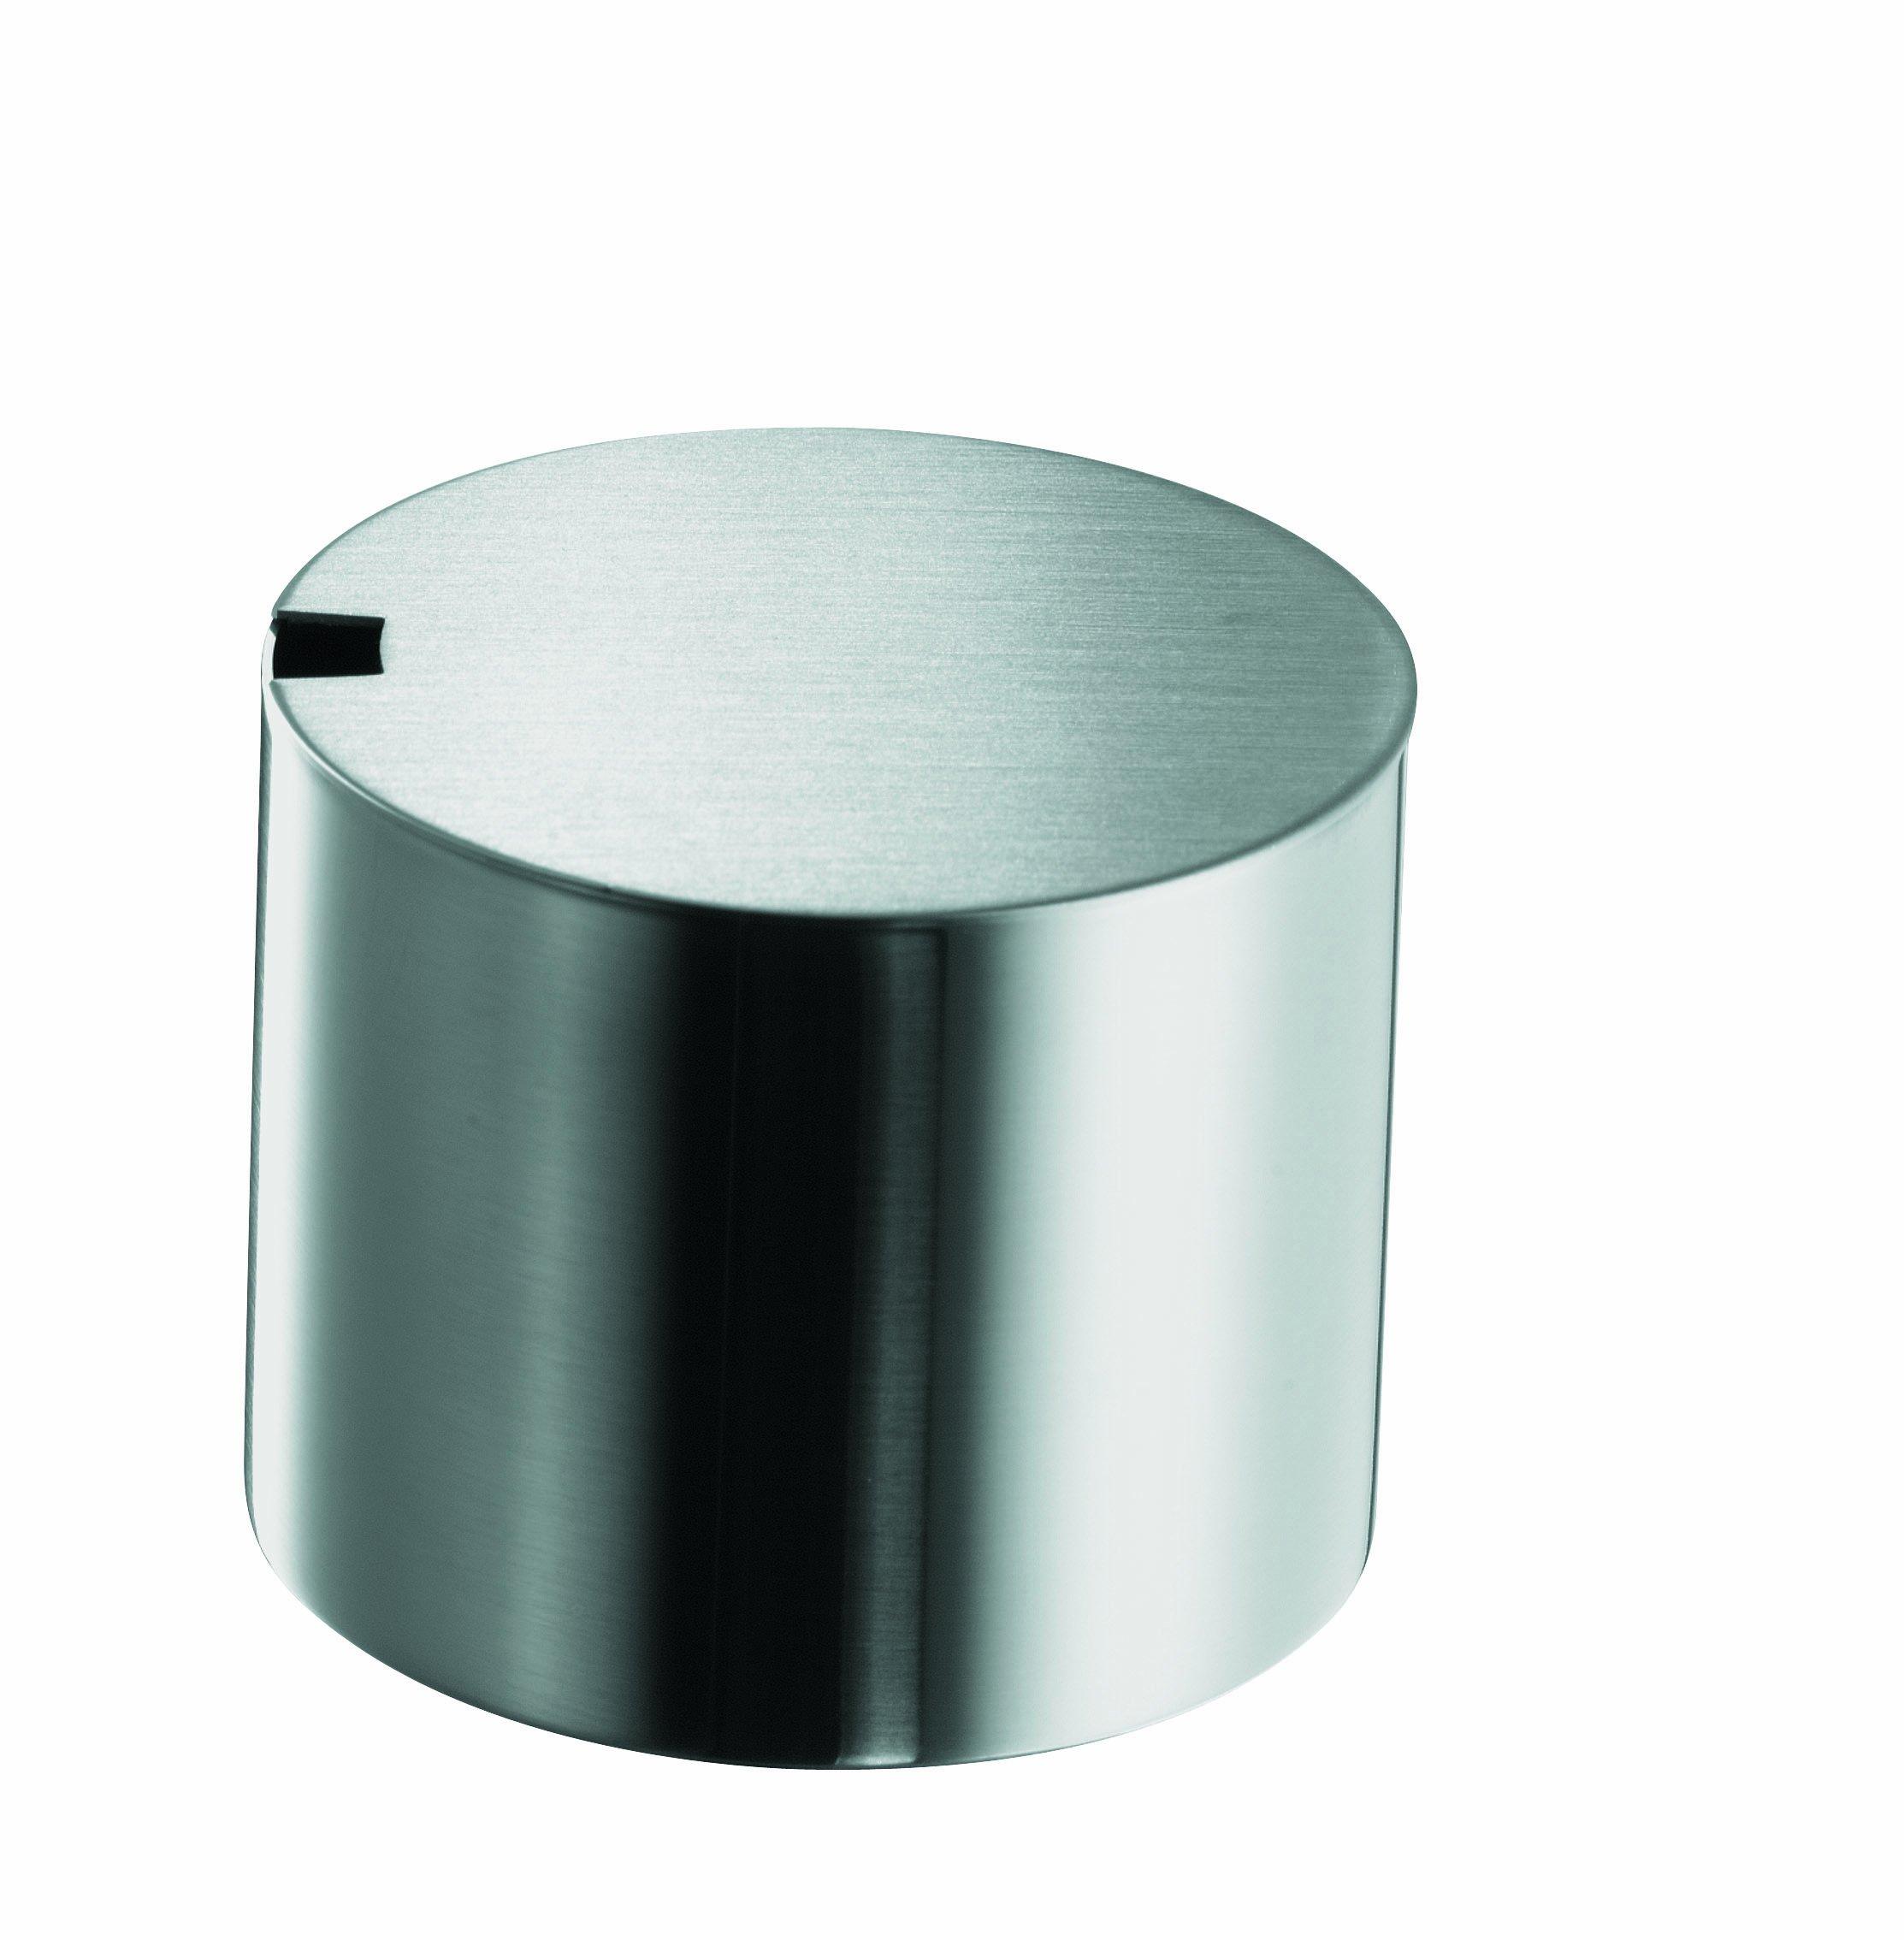 Stelton Arne Jacobsen Sugar Bowl, 6.76 oz